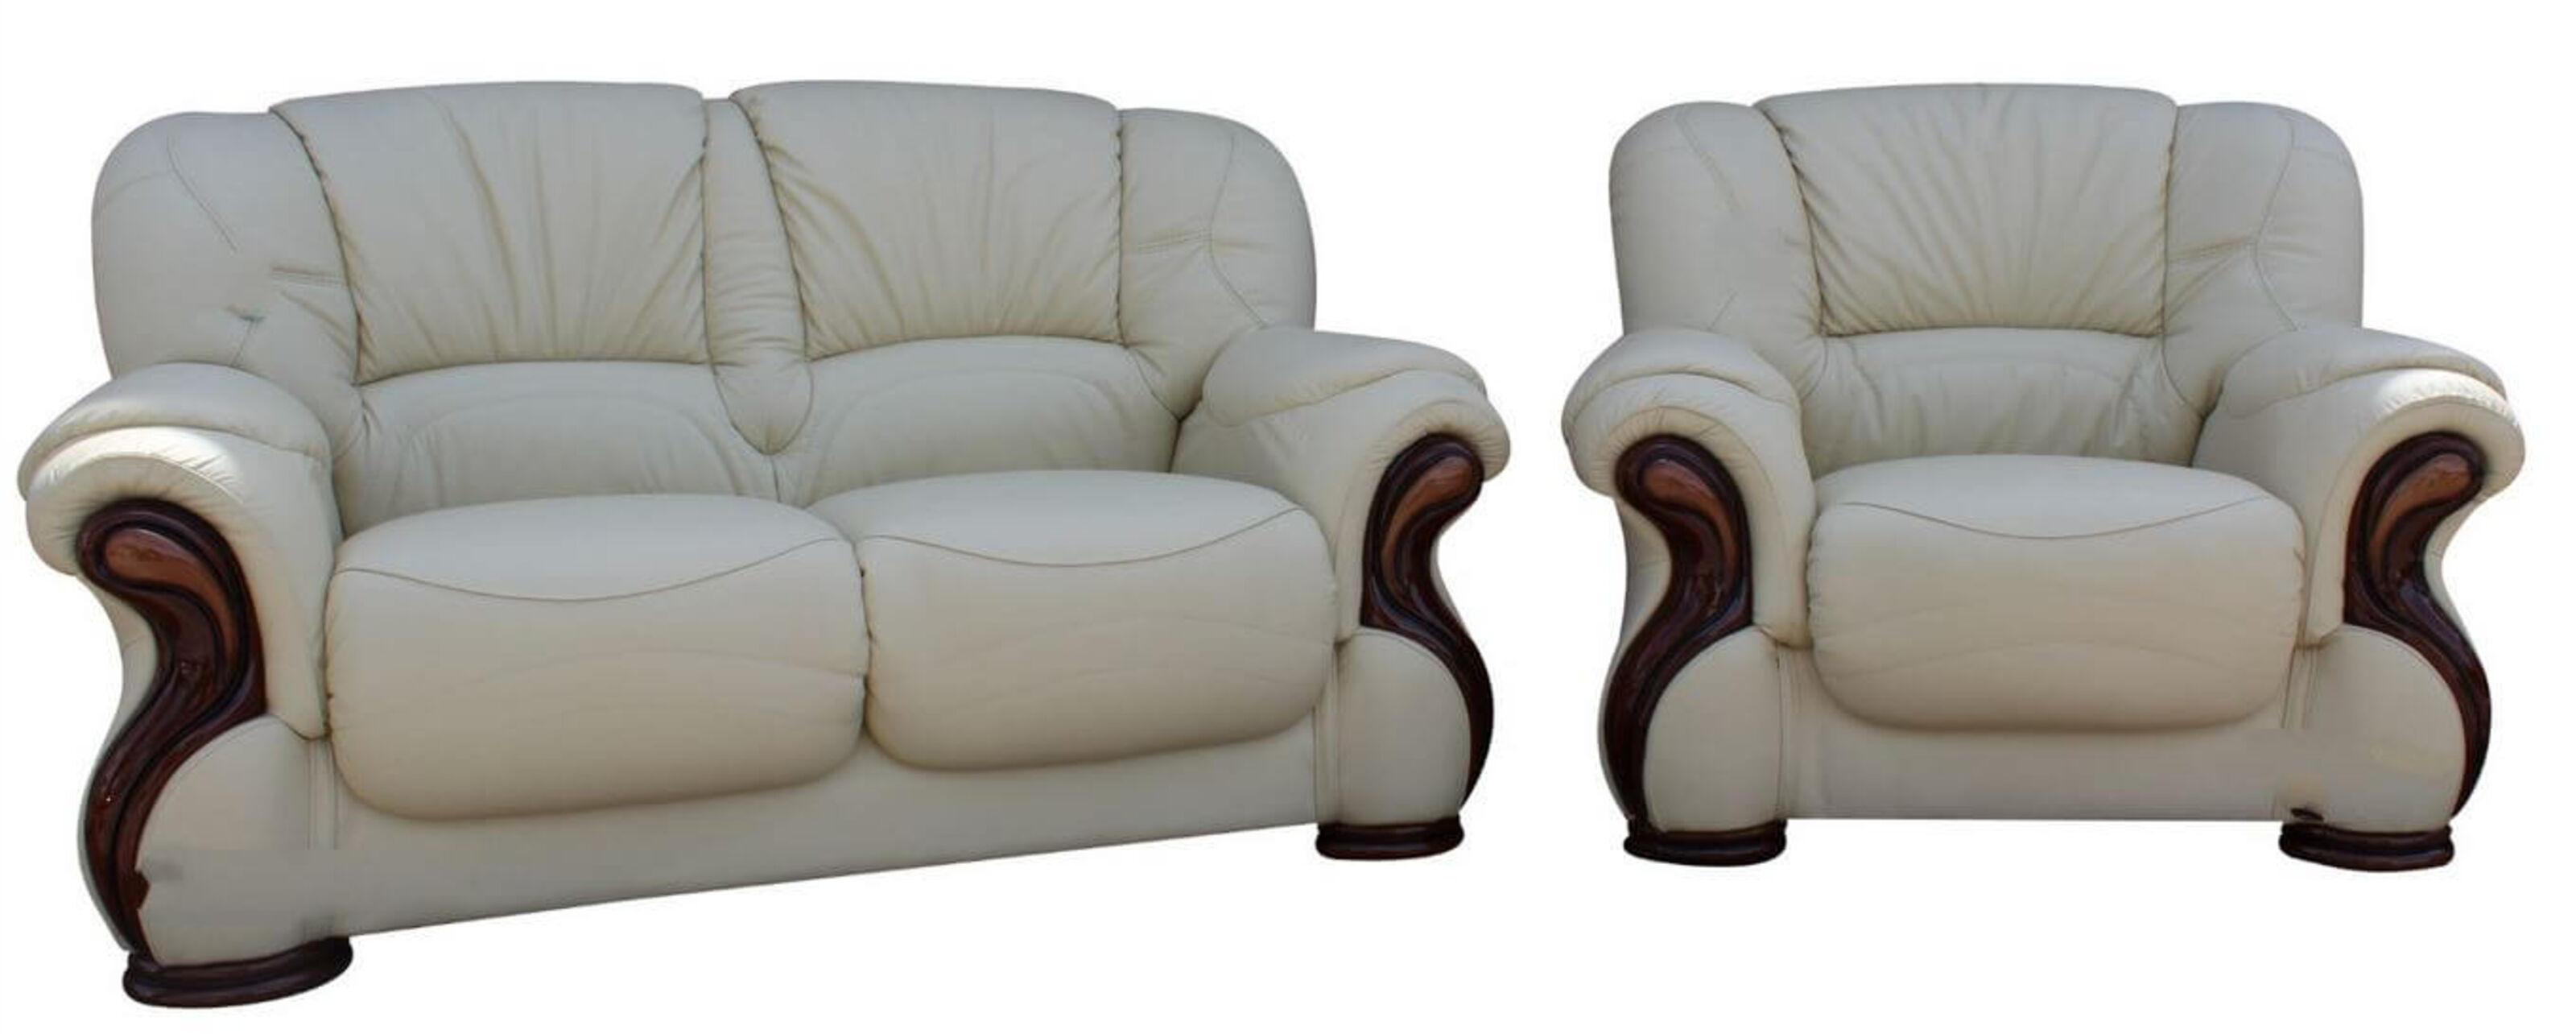 Prime Susanna 2 1 Italian Leather Sofa Suite Cream Offer Theyellowbook Wood Chair Design Ideas Theyellowbookinfo